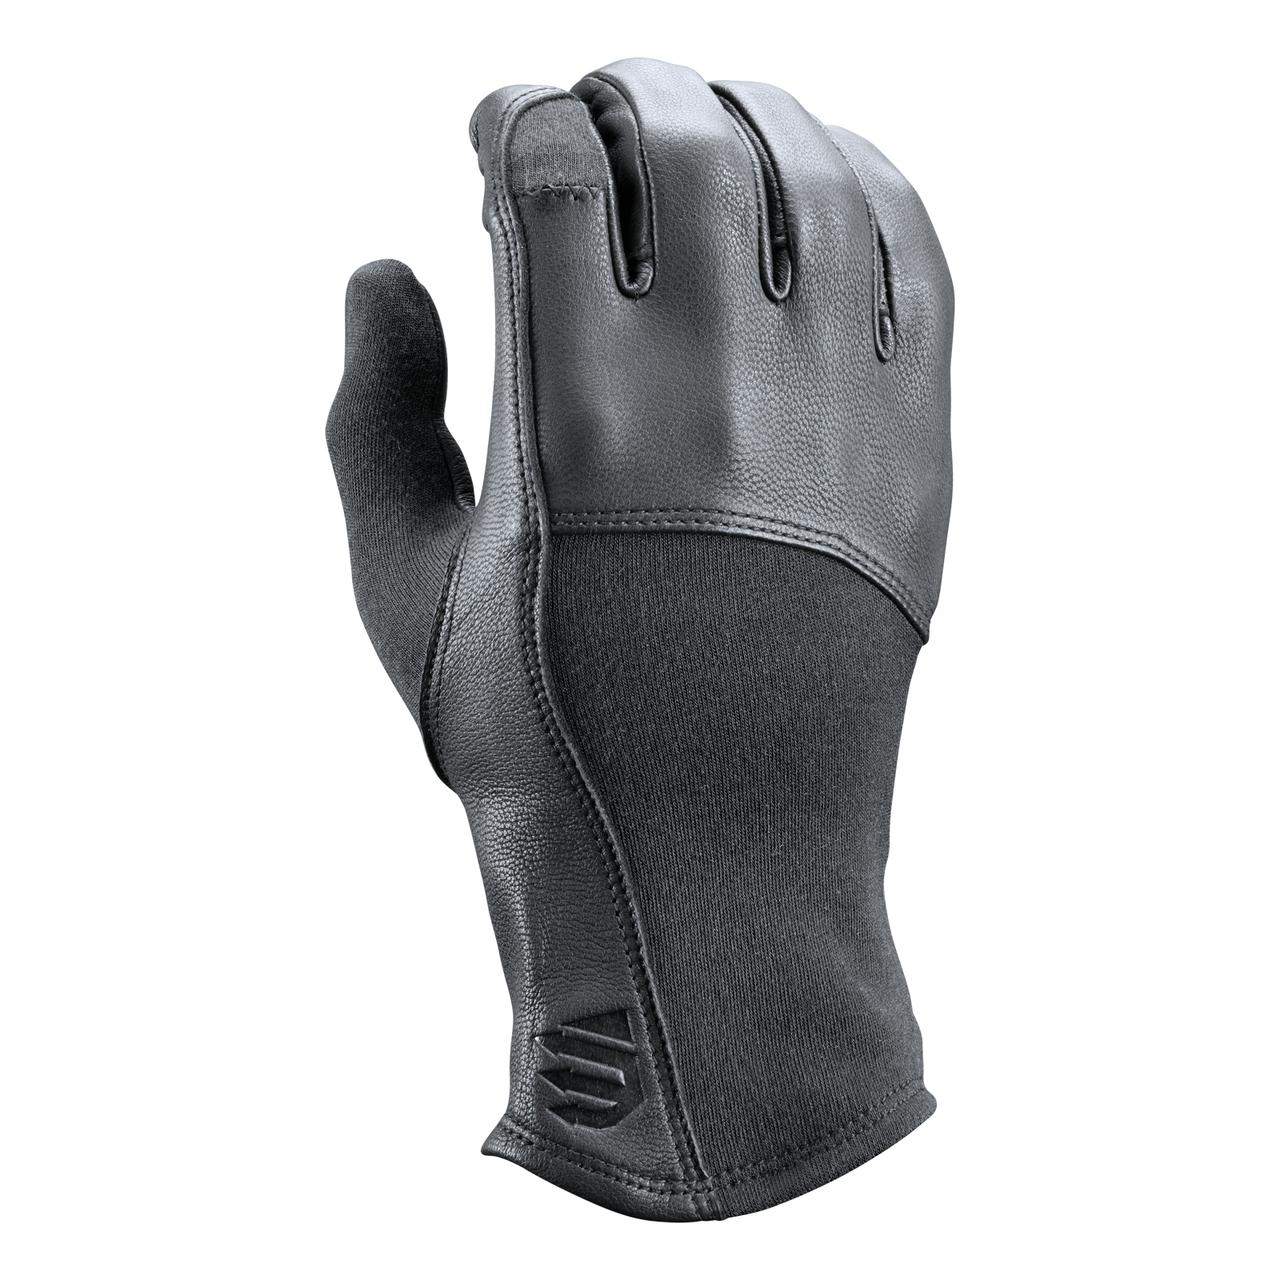 BLACKHAWK A.V.I.A.T.O.R Glove Black Large